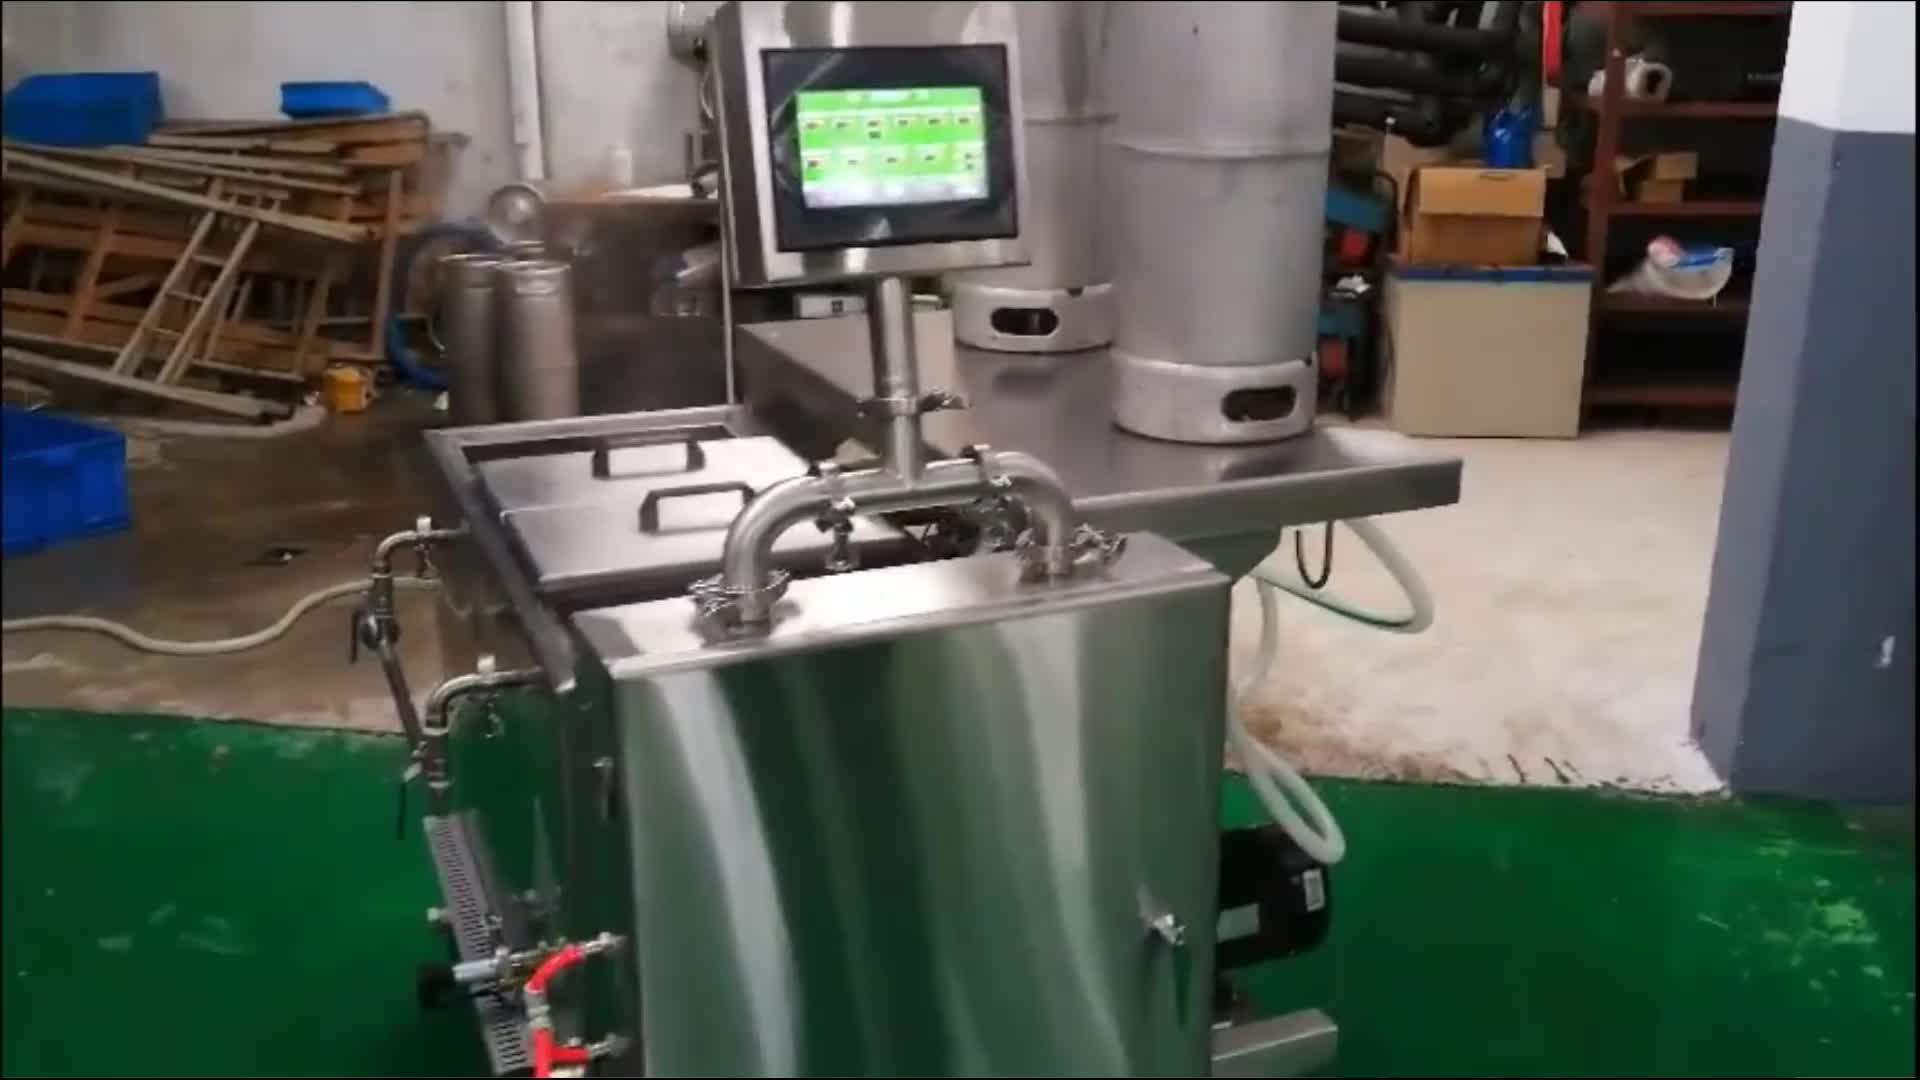 Máquina de limpeza de barril de cerveja de aço inoxidável semi-auto arruela de limpador de barril de cerveja à venda